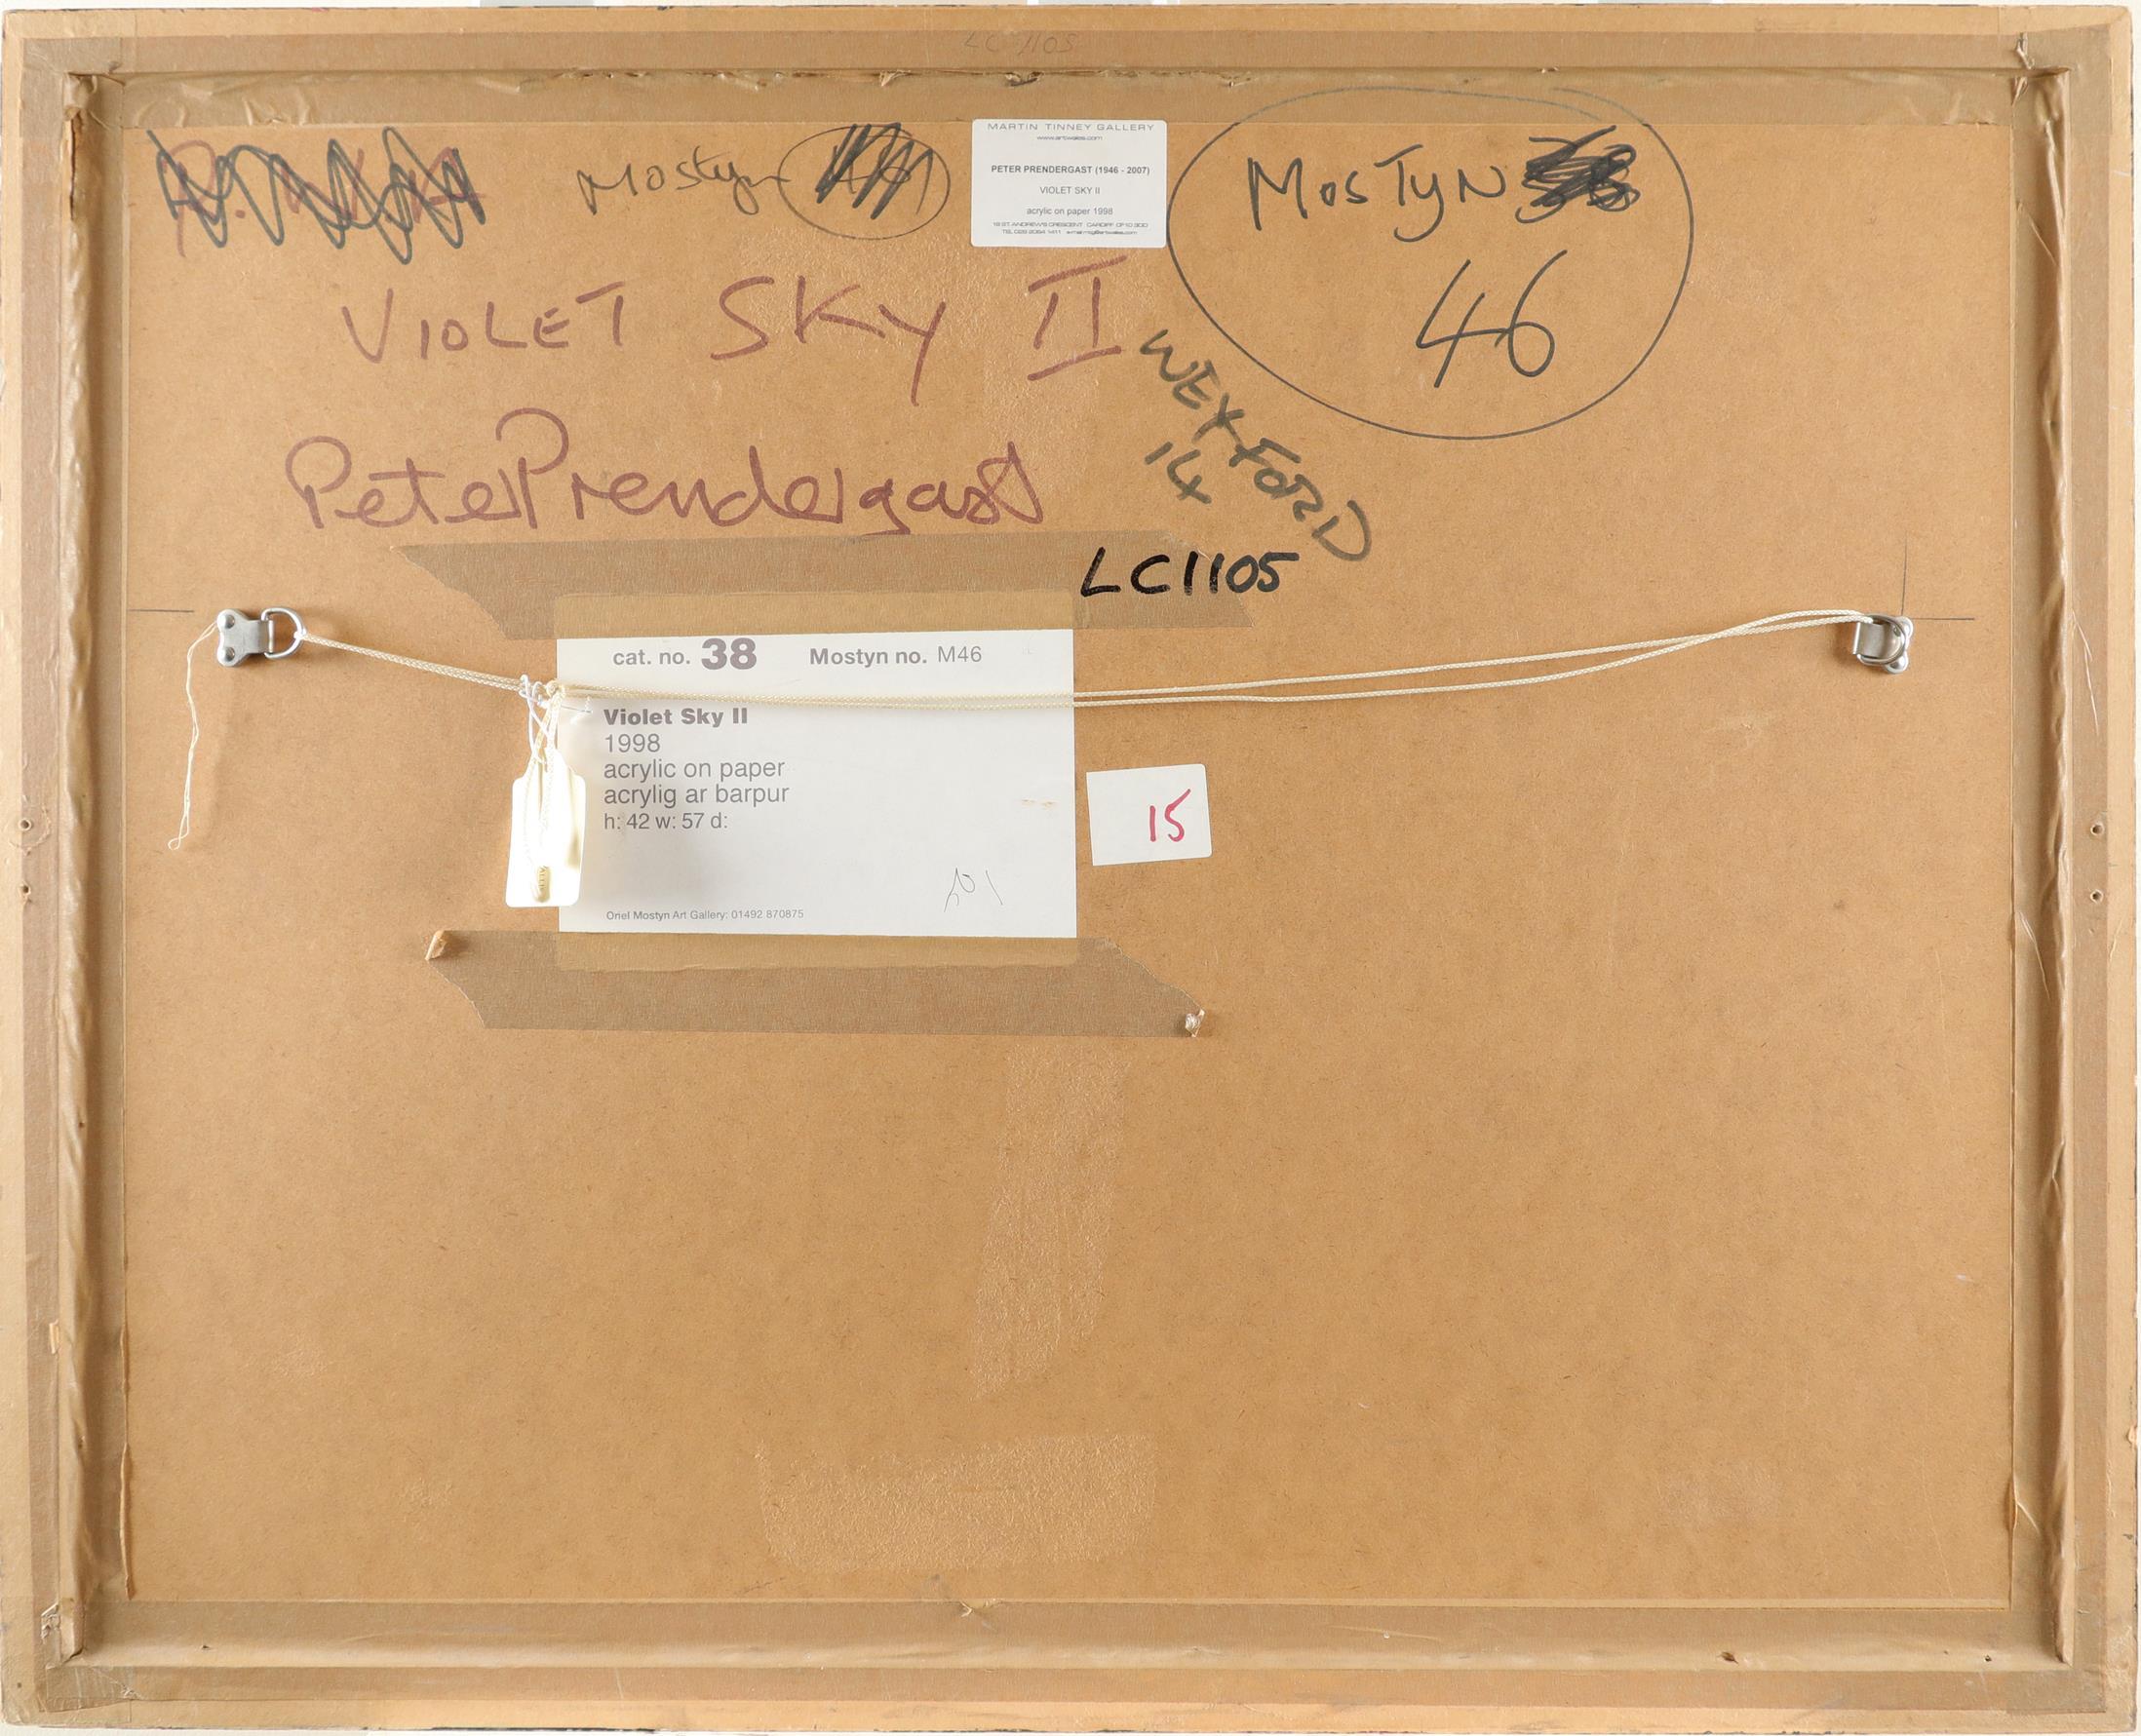 ‡Peter Prendergast (Welsh 1946-2007) Violet Sky II Signed Peter Prendergast (lower right), and - Image 3 of 3